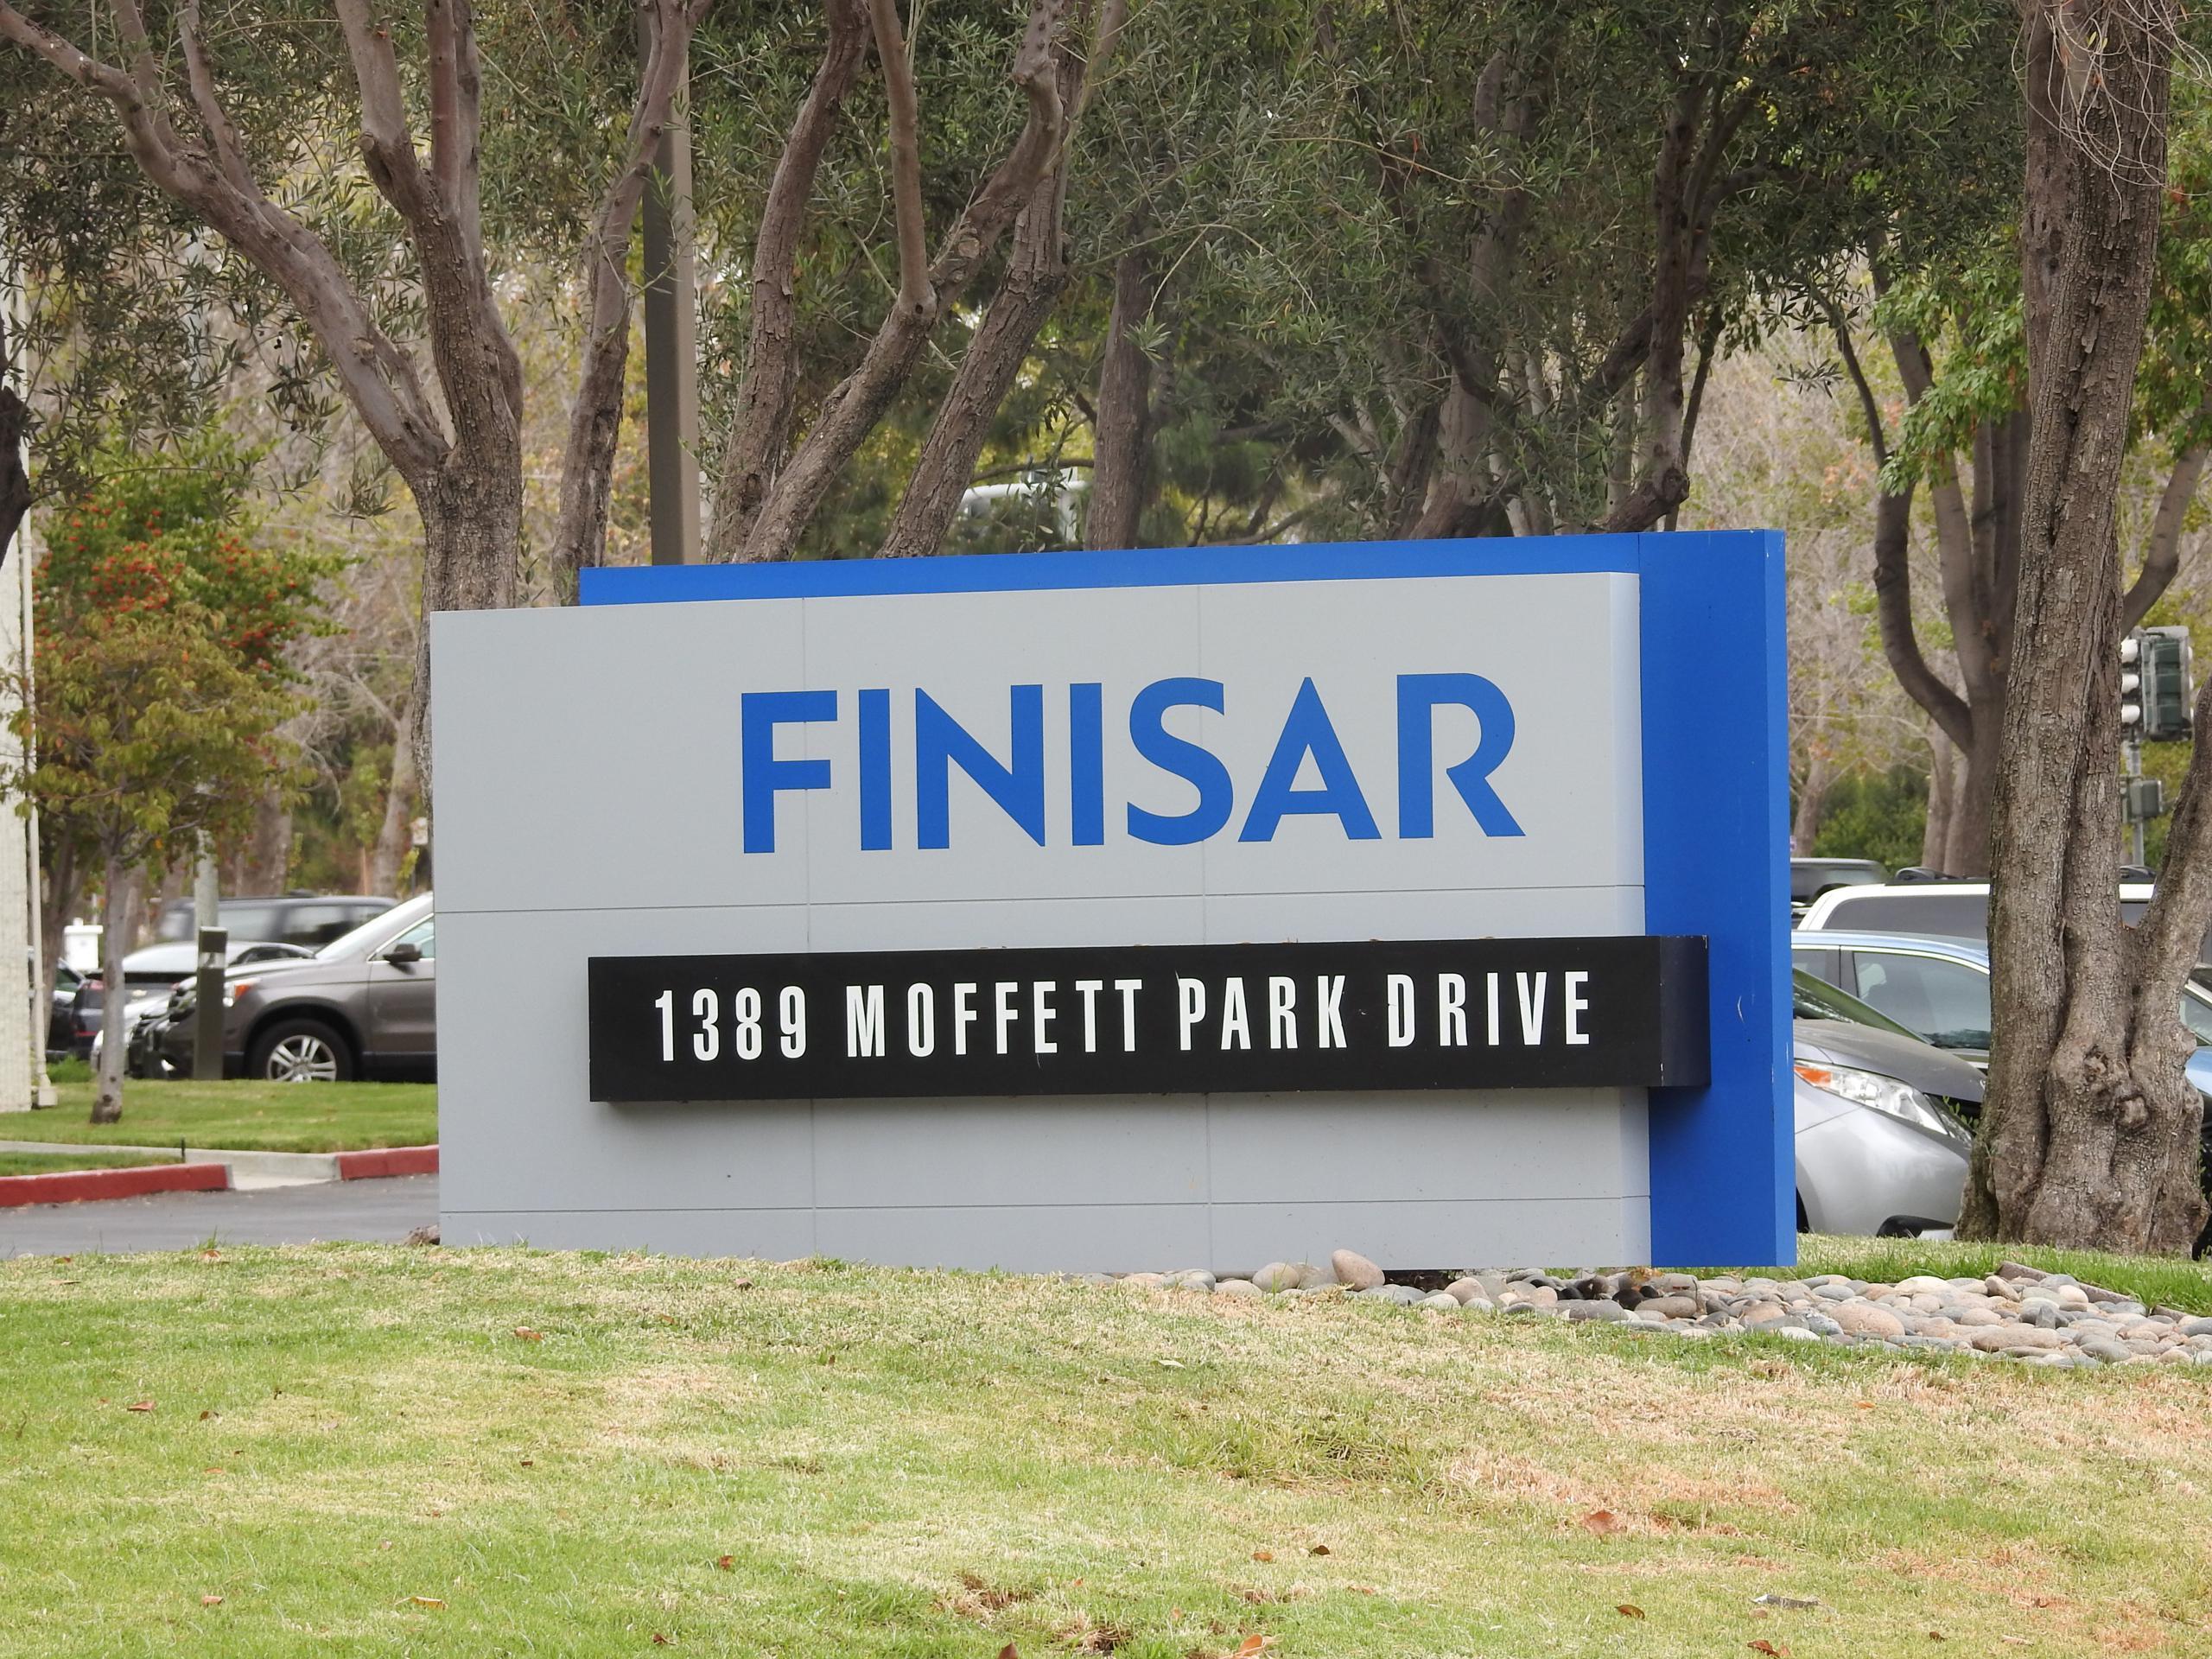 Entrance to Finisar's corporate headquarters in Sunnyvale, California.